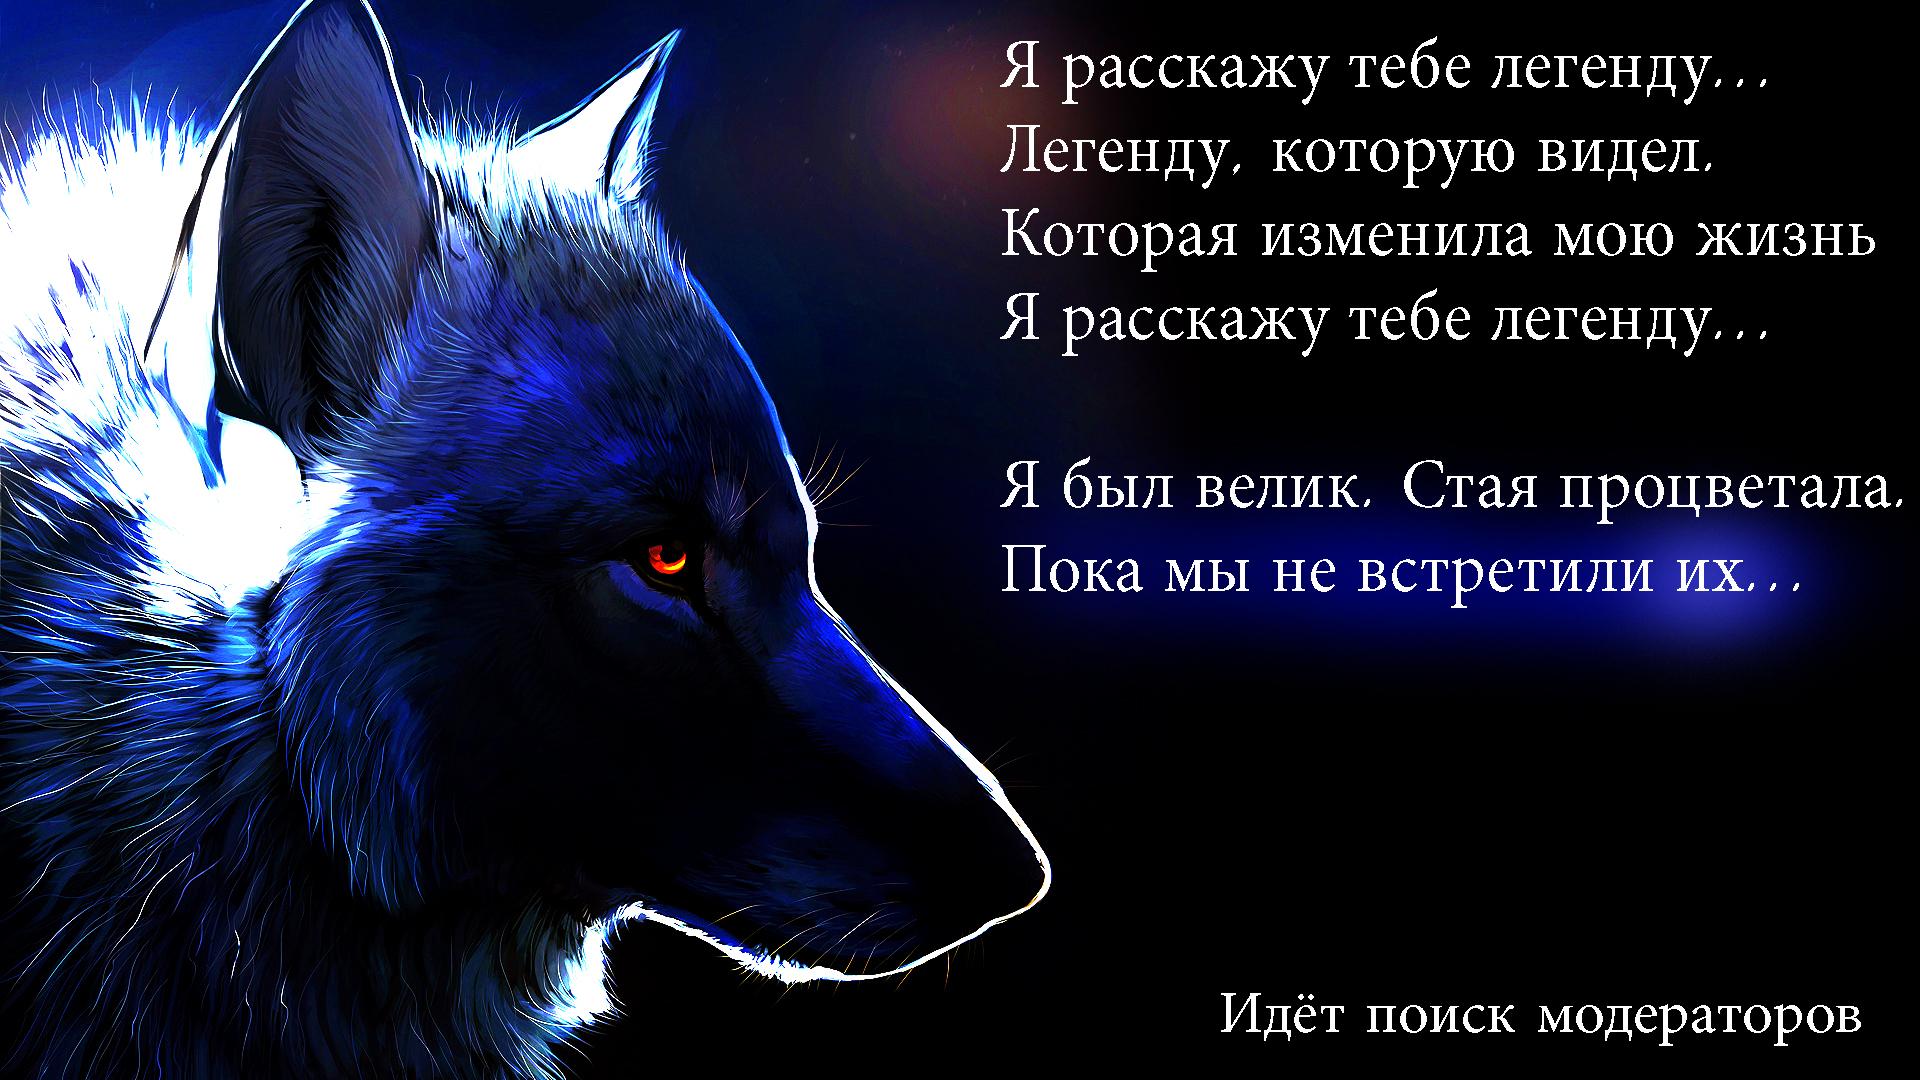 http://se.uploads.ru/v4DWO.jpg